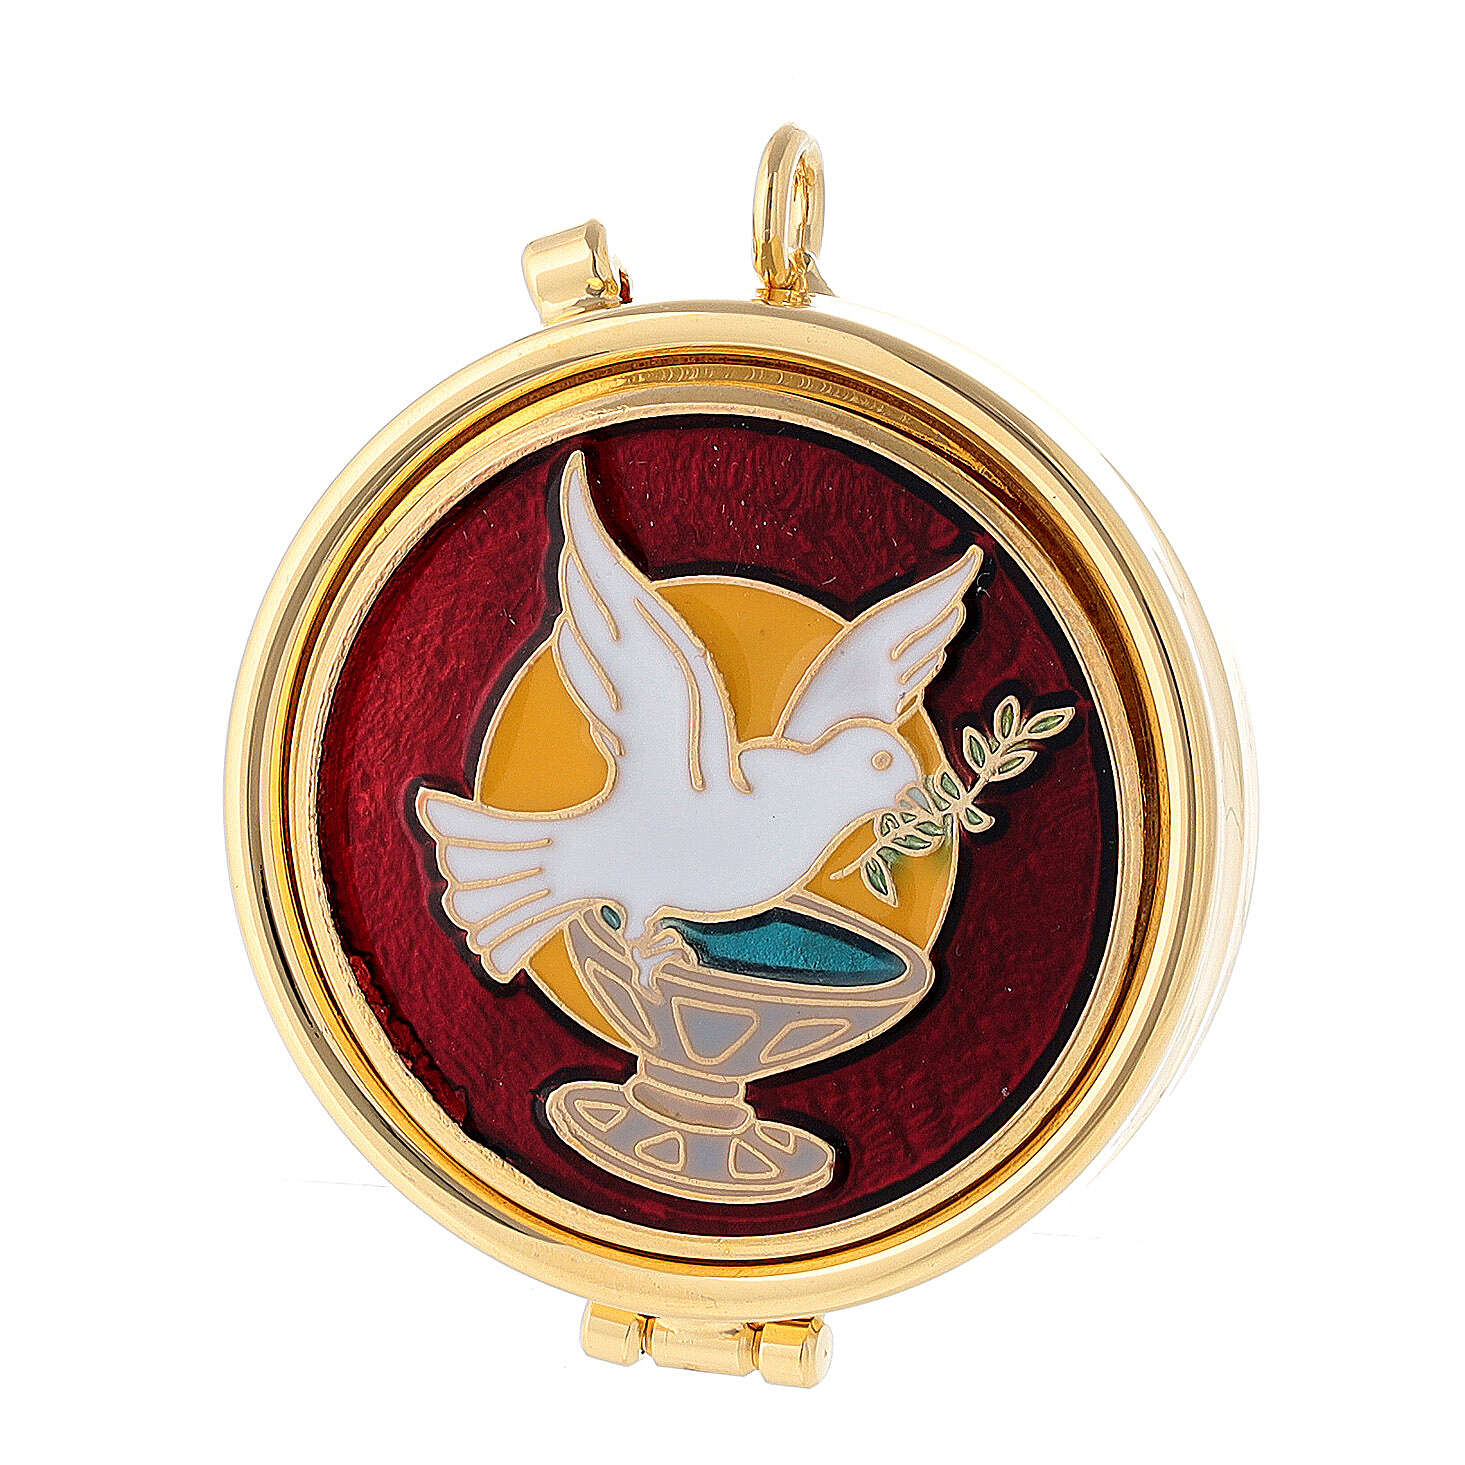 Custode pour eucharistie colombe olivier 3